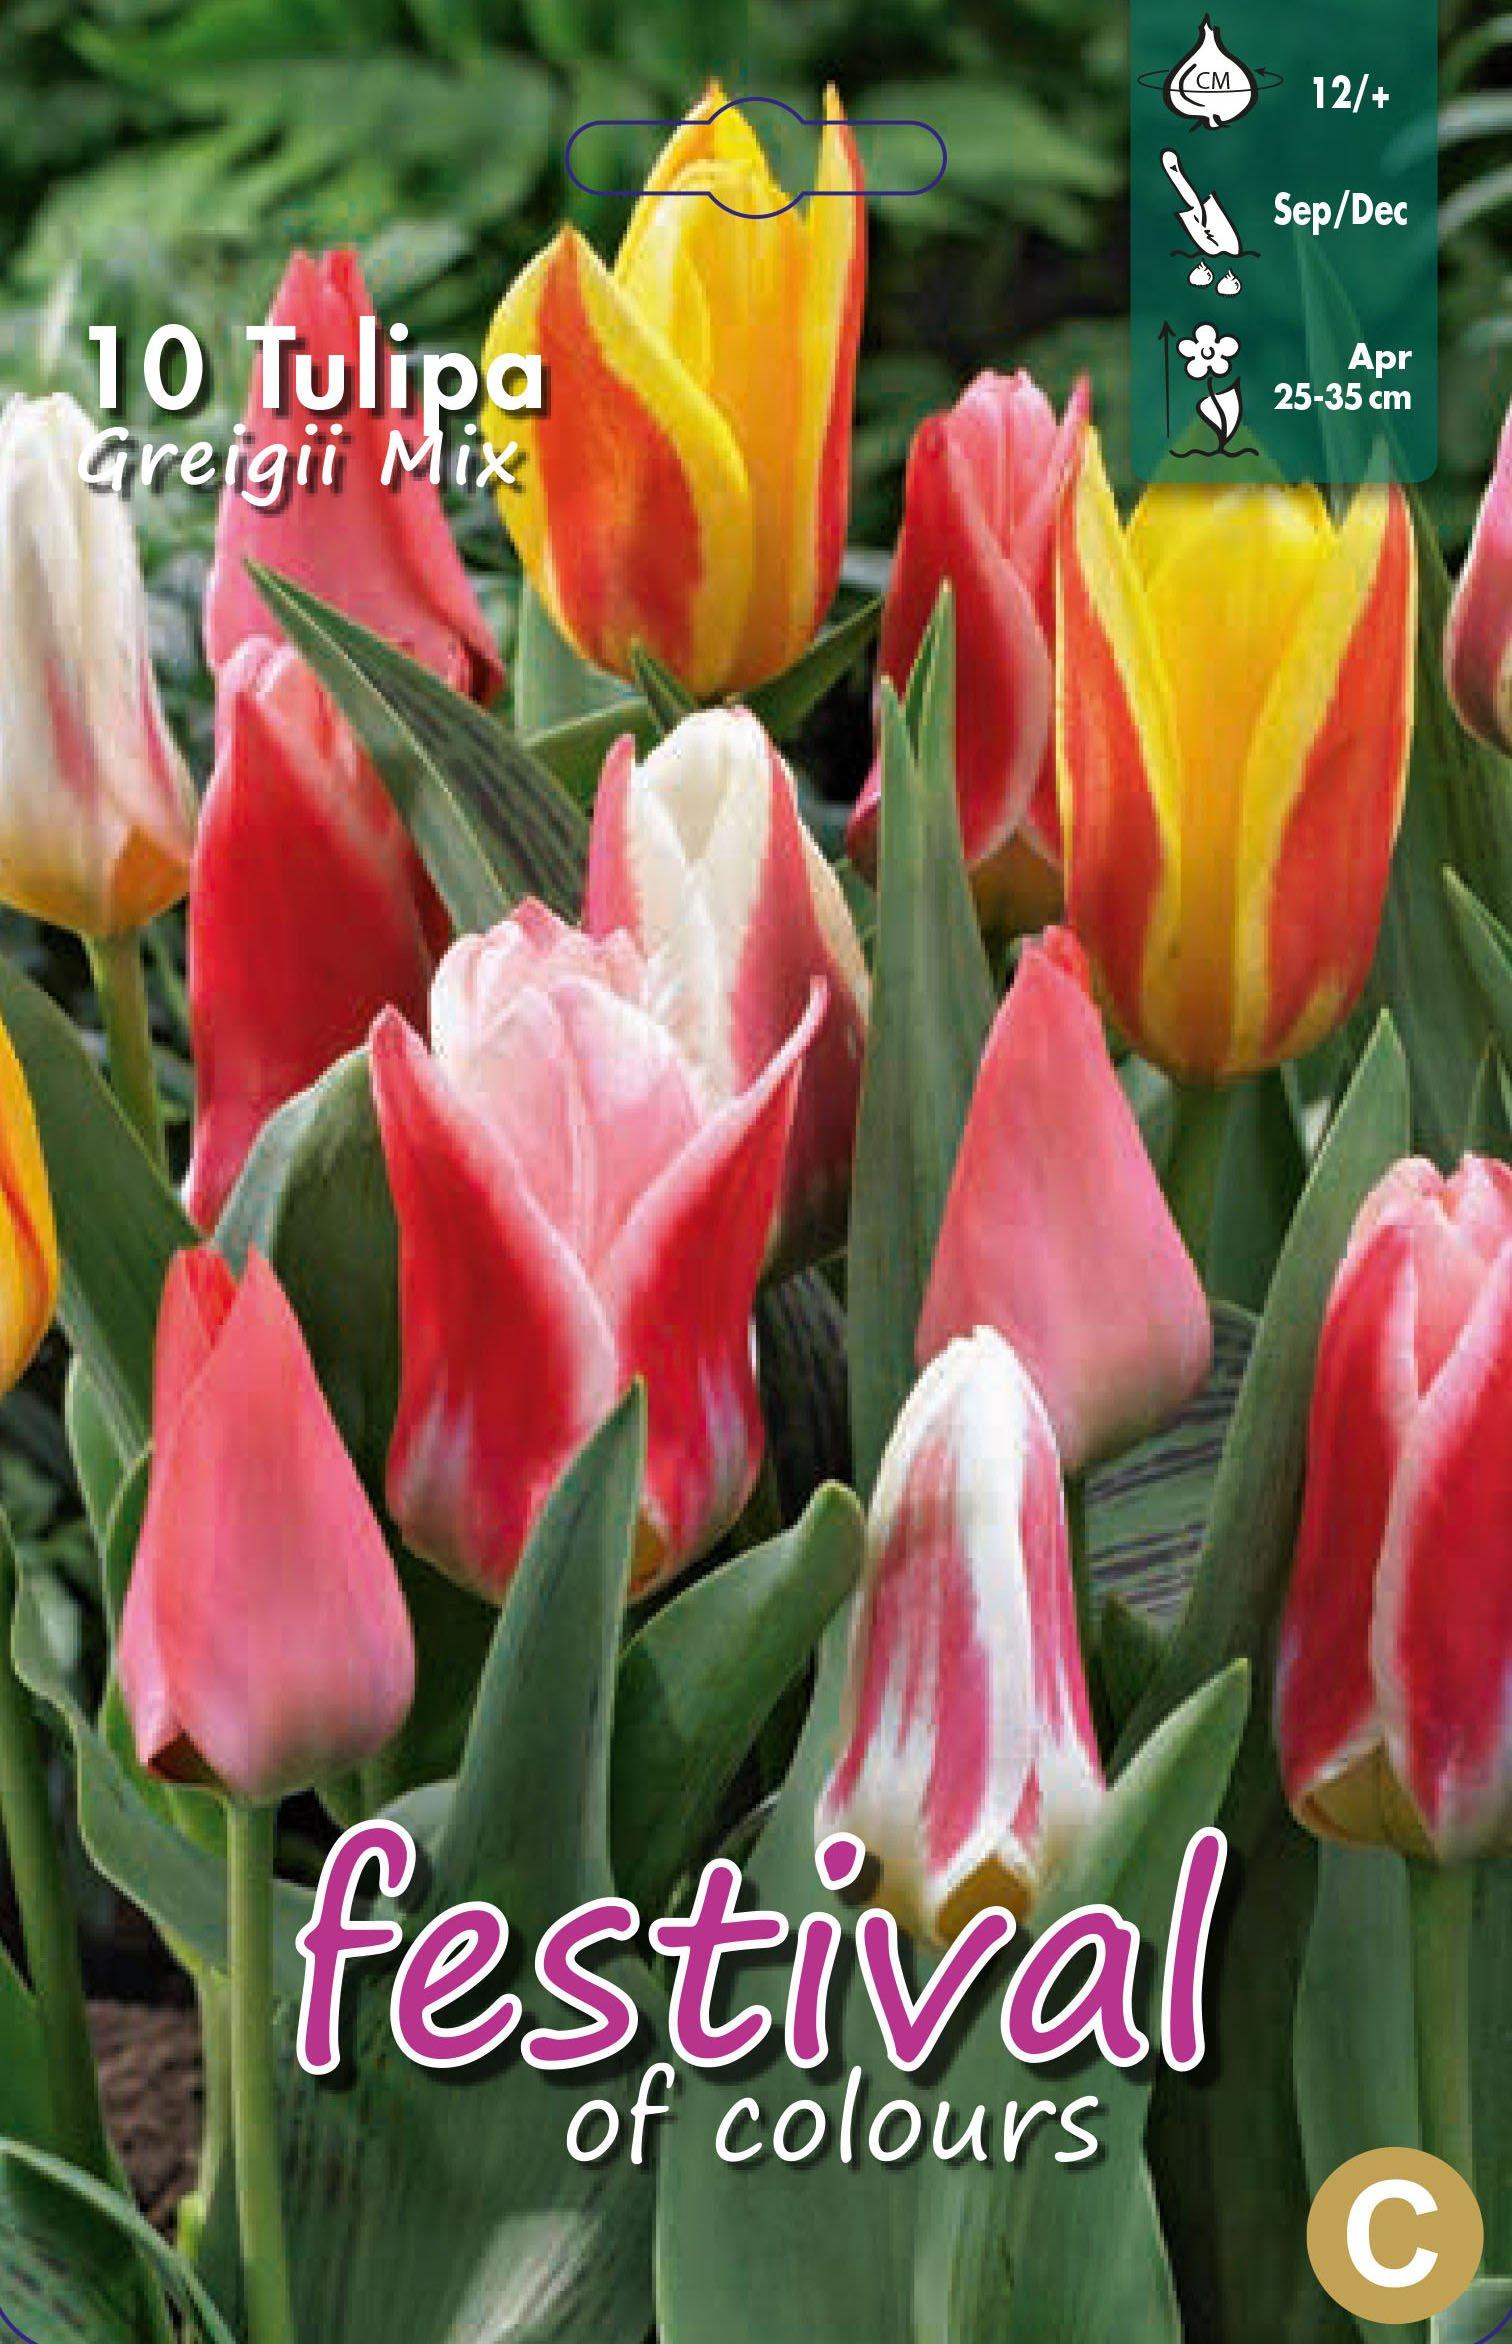 Tulipa Greigii Mix 10 stk